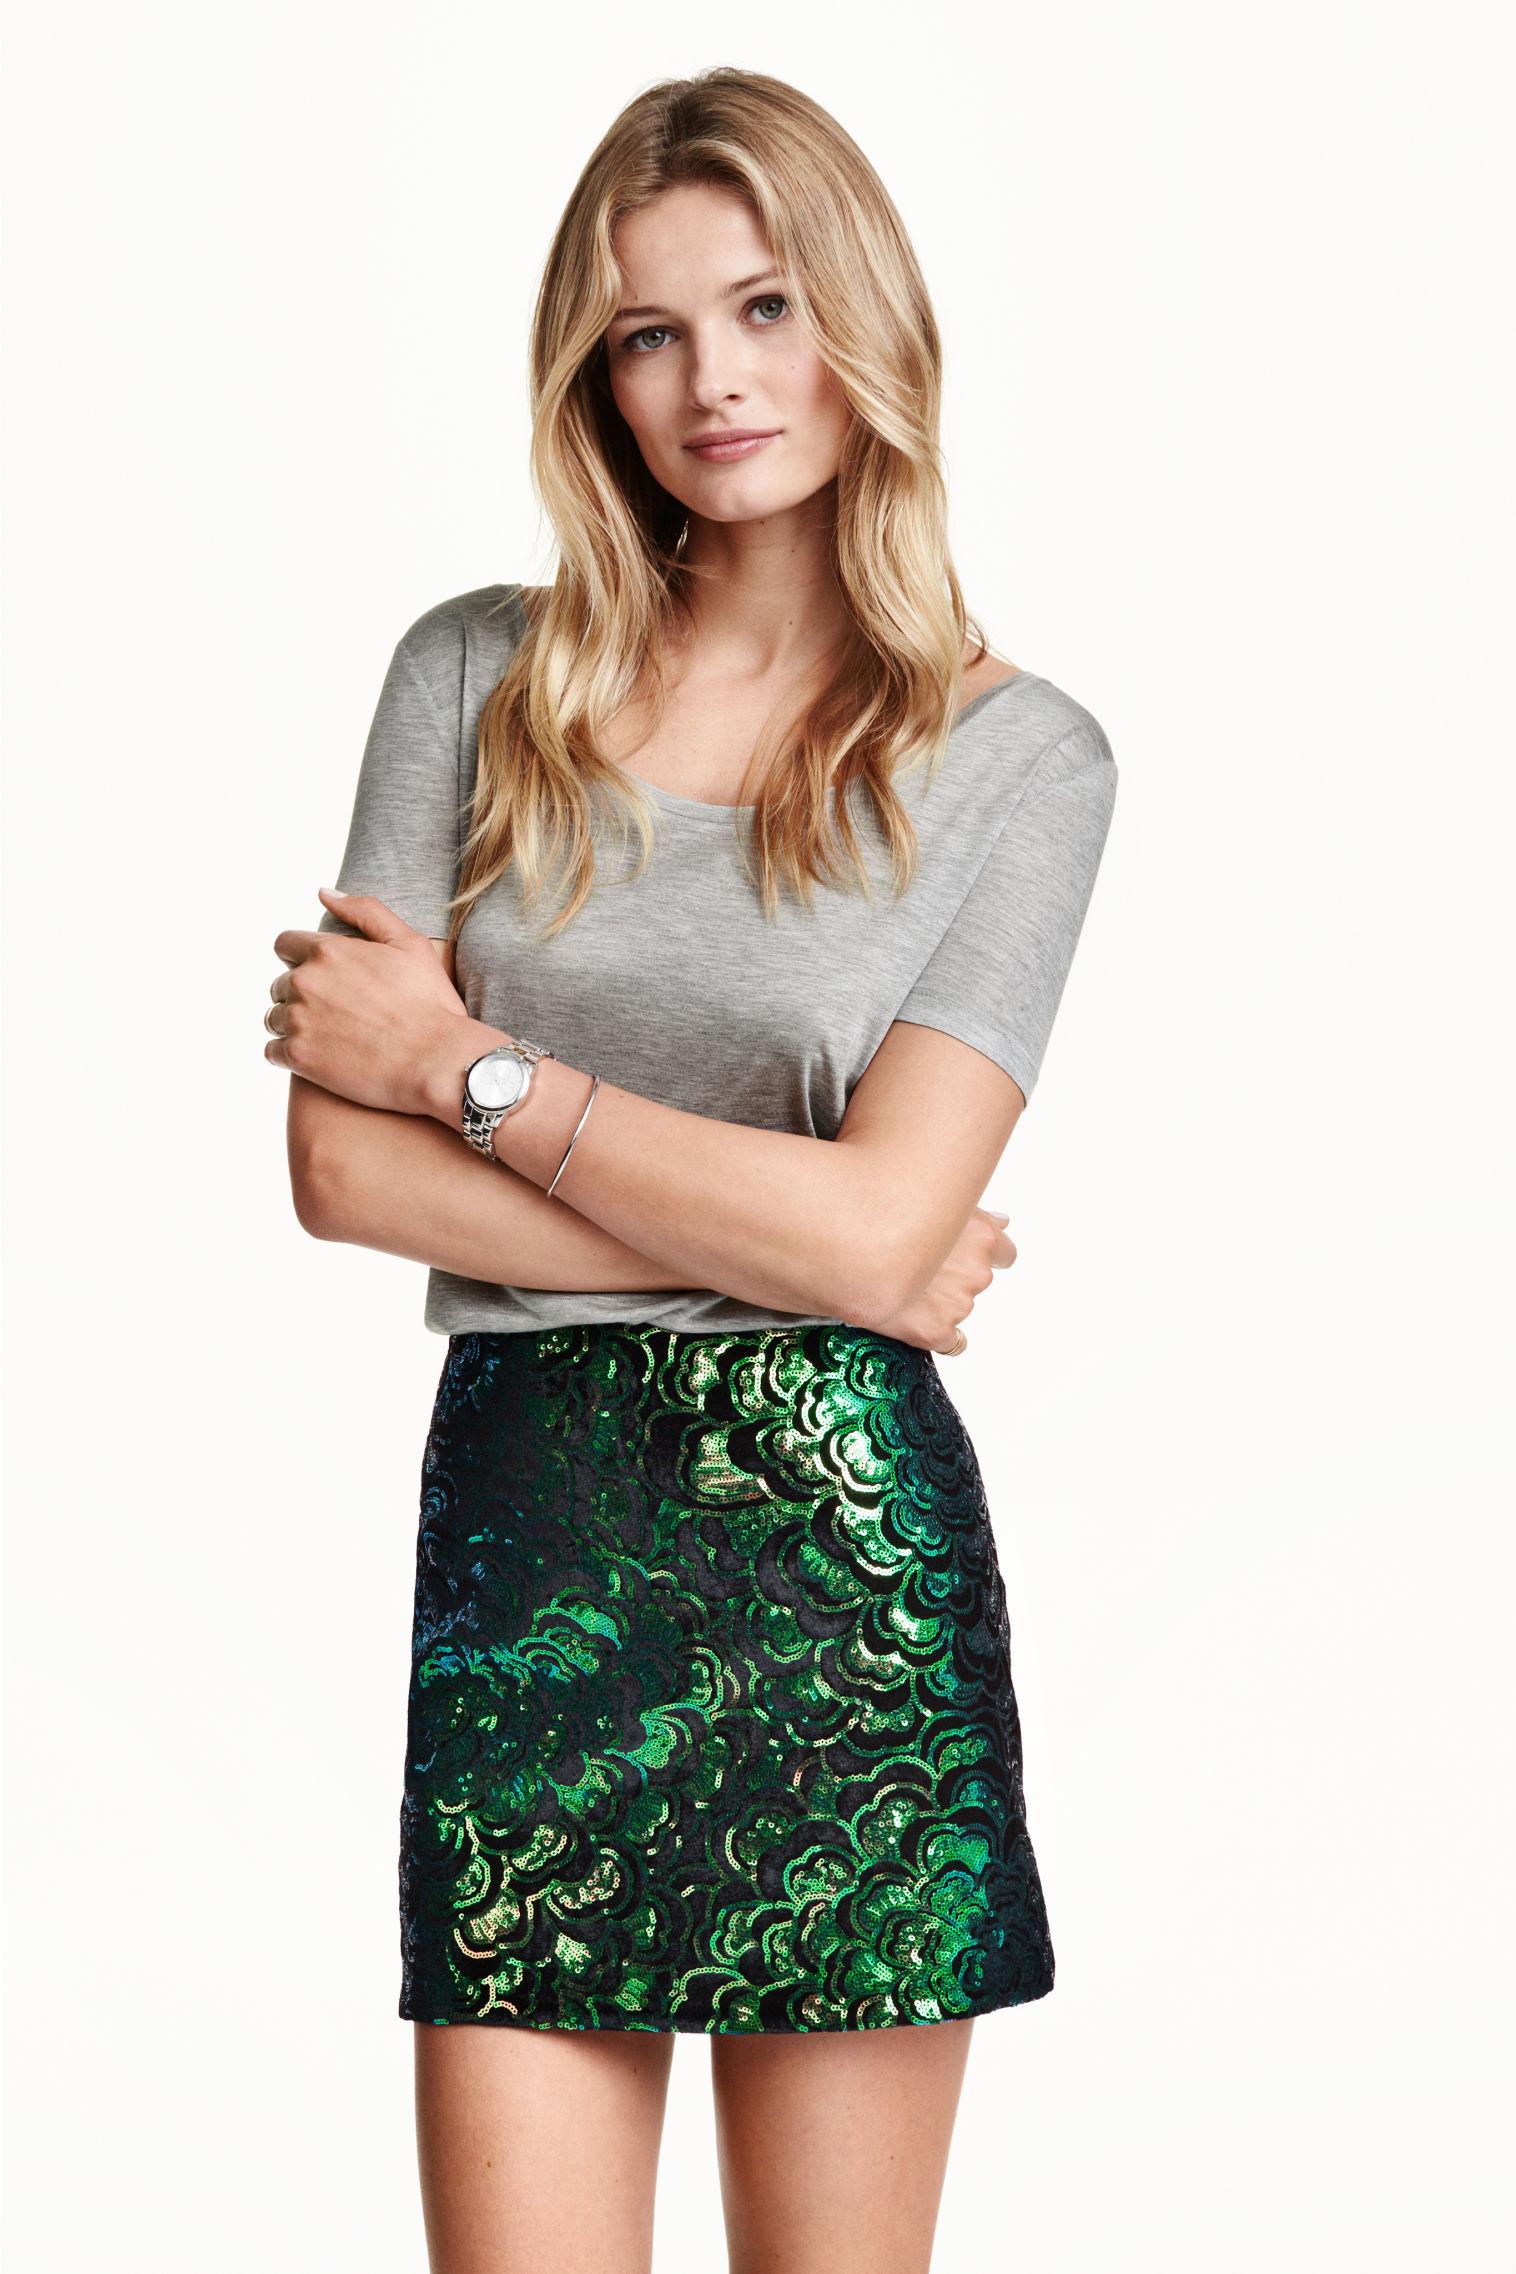 Sequined skirt - Black/Green - Ladies | H&M GB